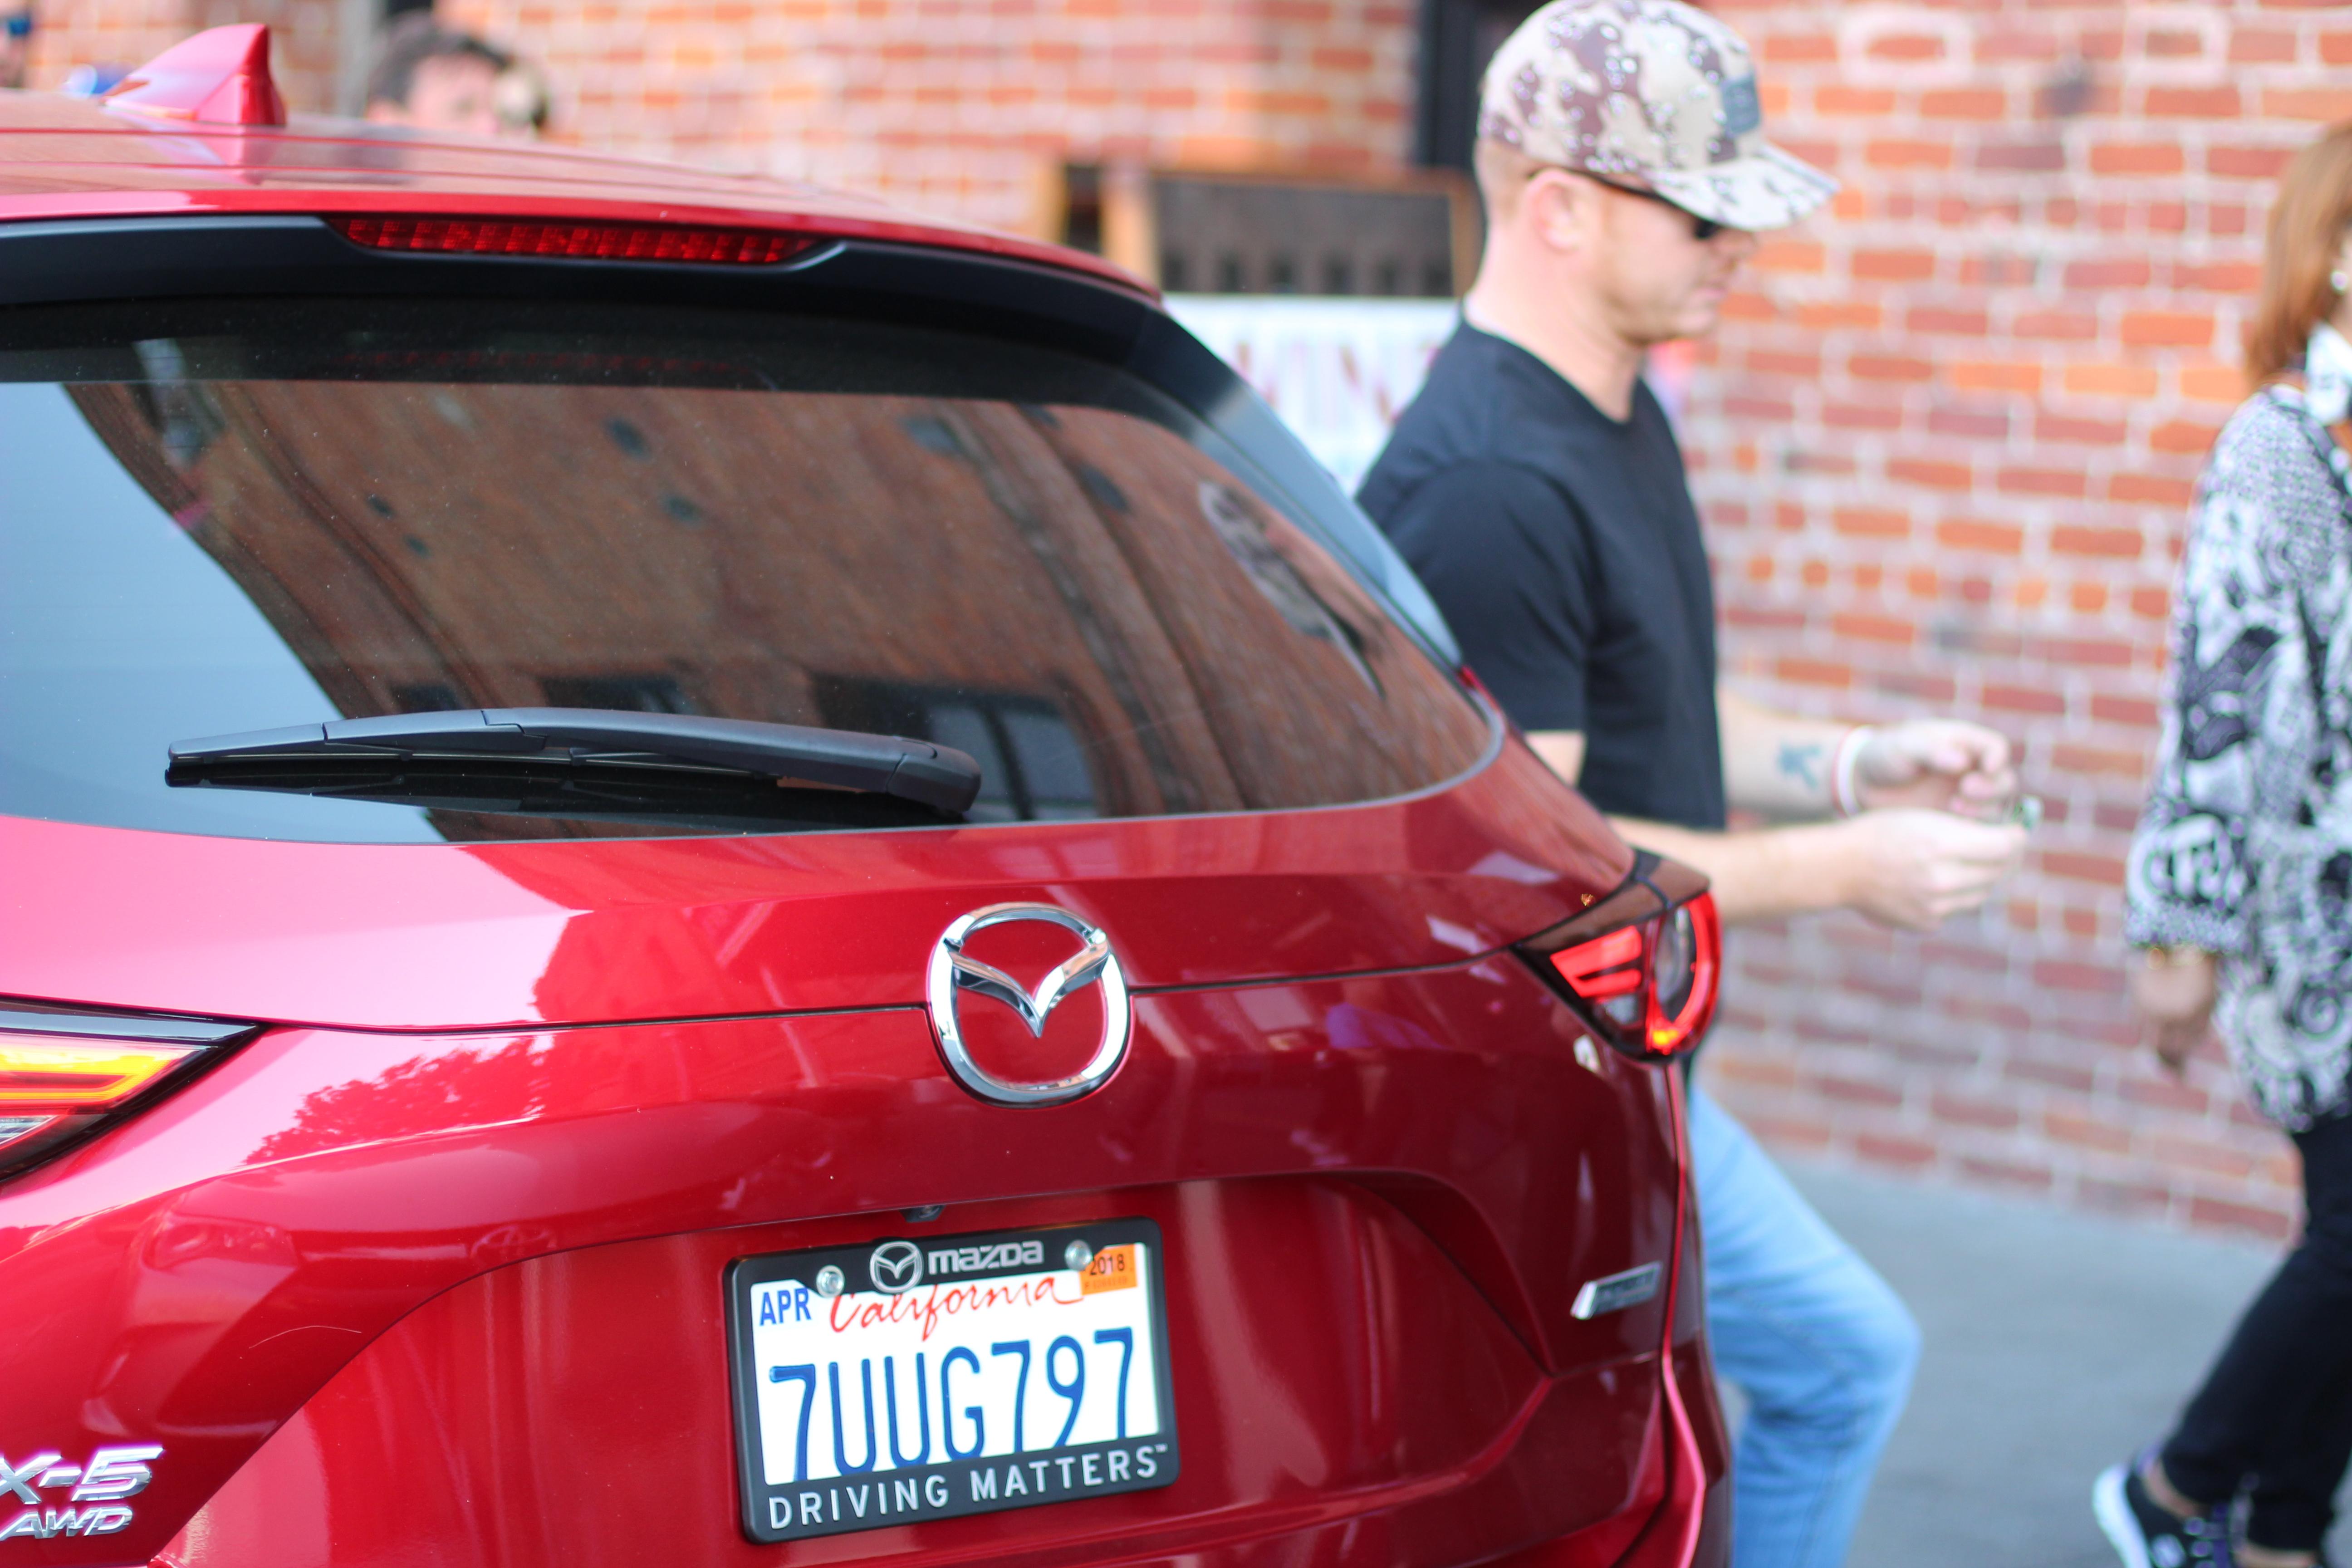 Drivetime car rental